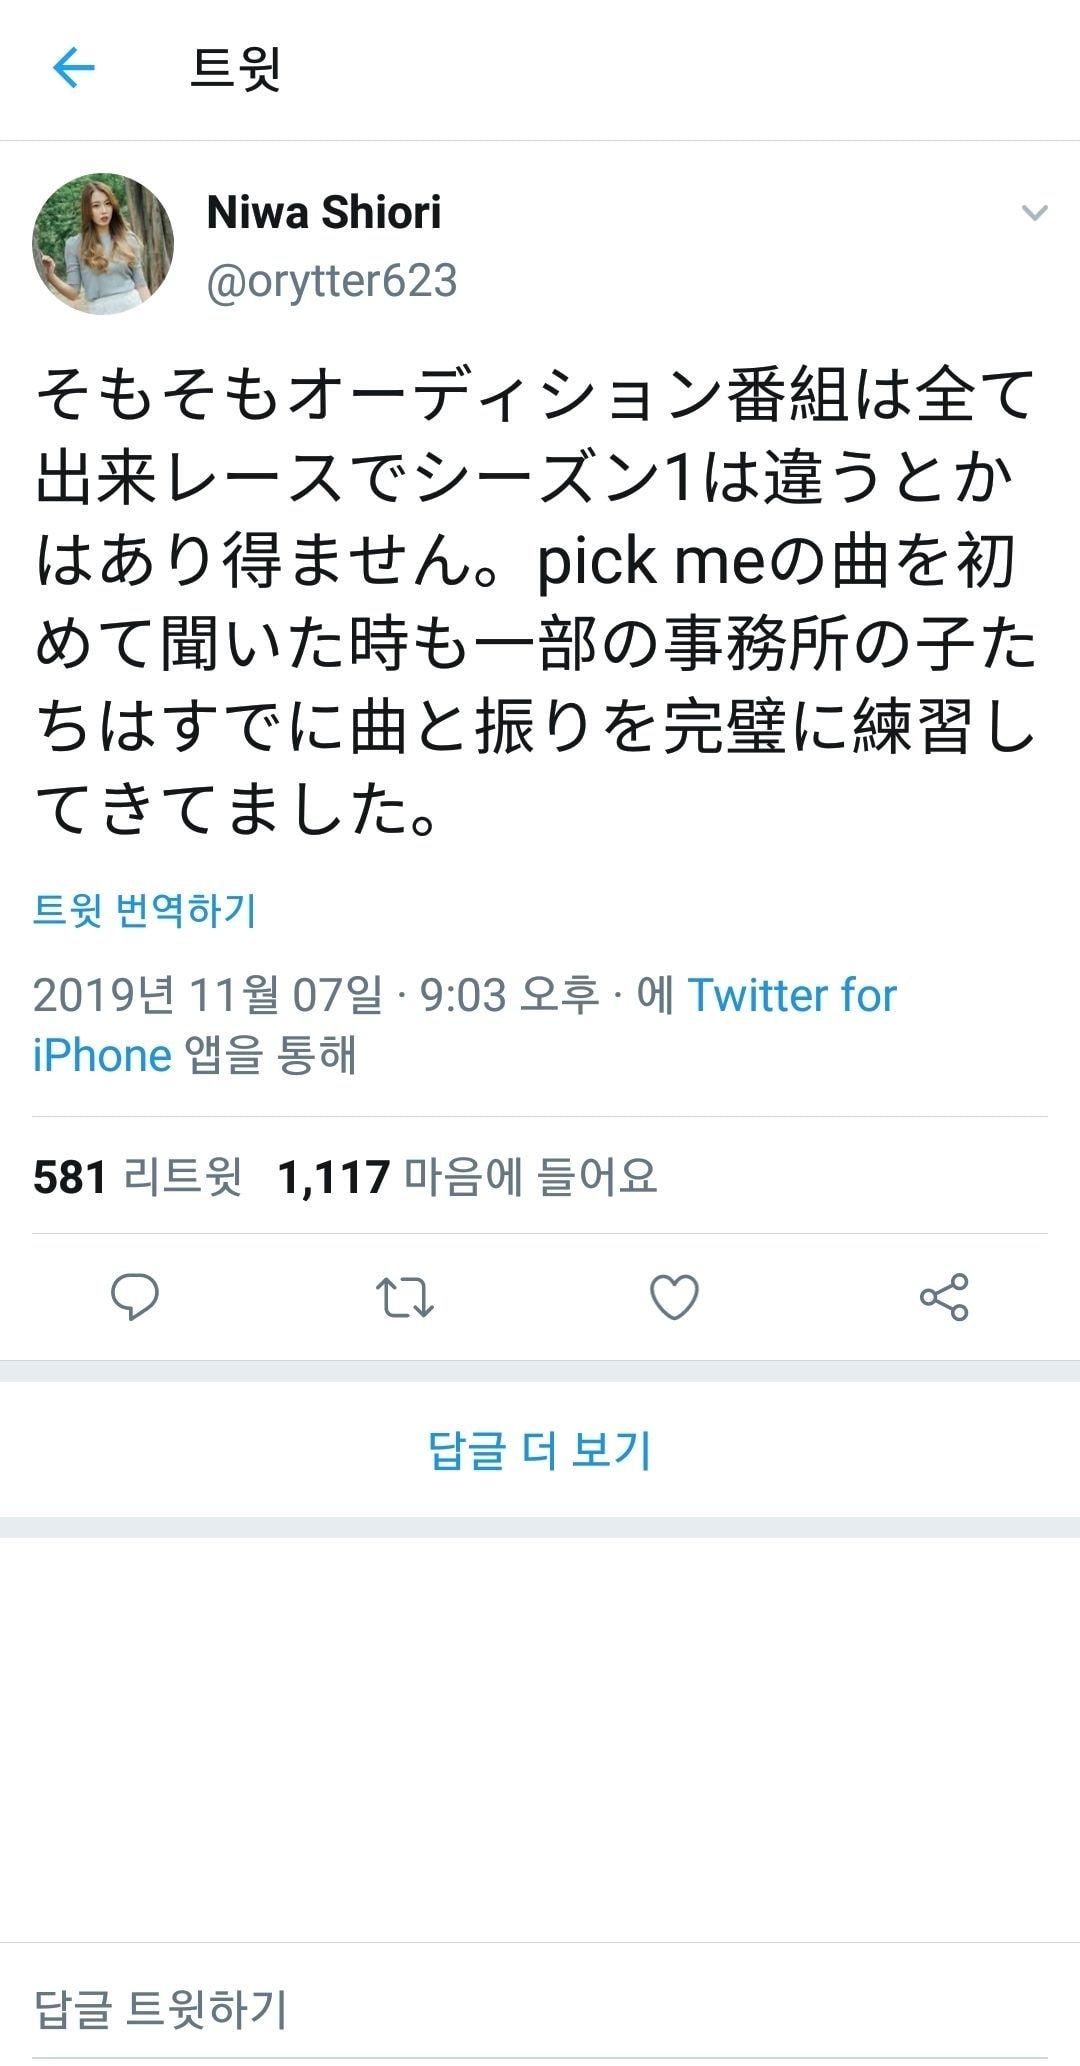 《PRODUCE 101》第一季选手丹羽紫央里透露说 部分练习生《Pick Me》中得到了优待